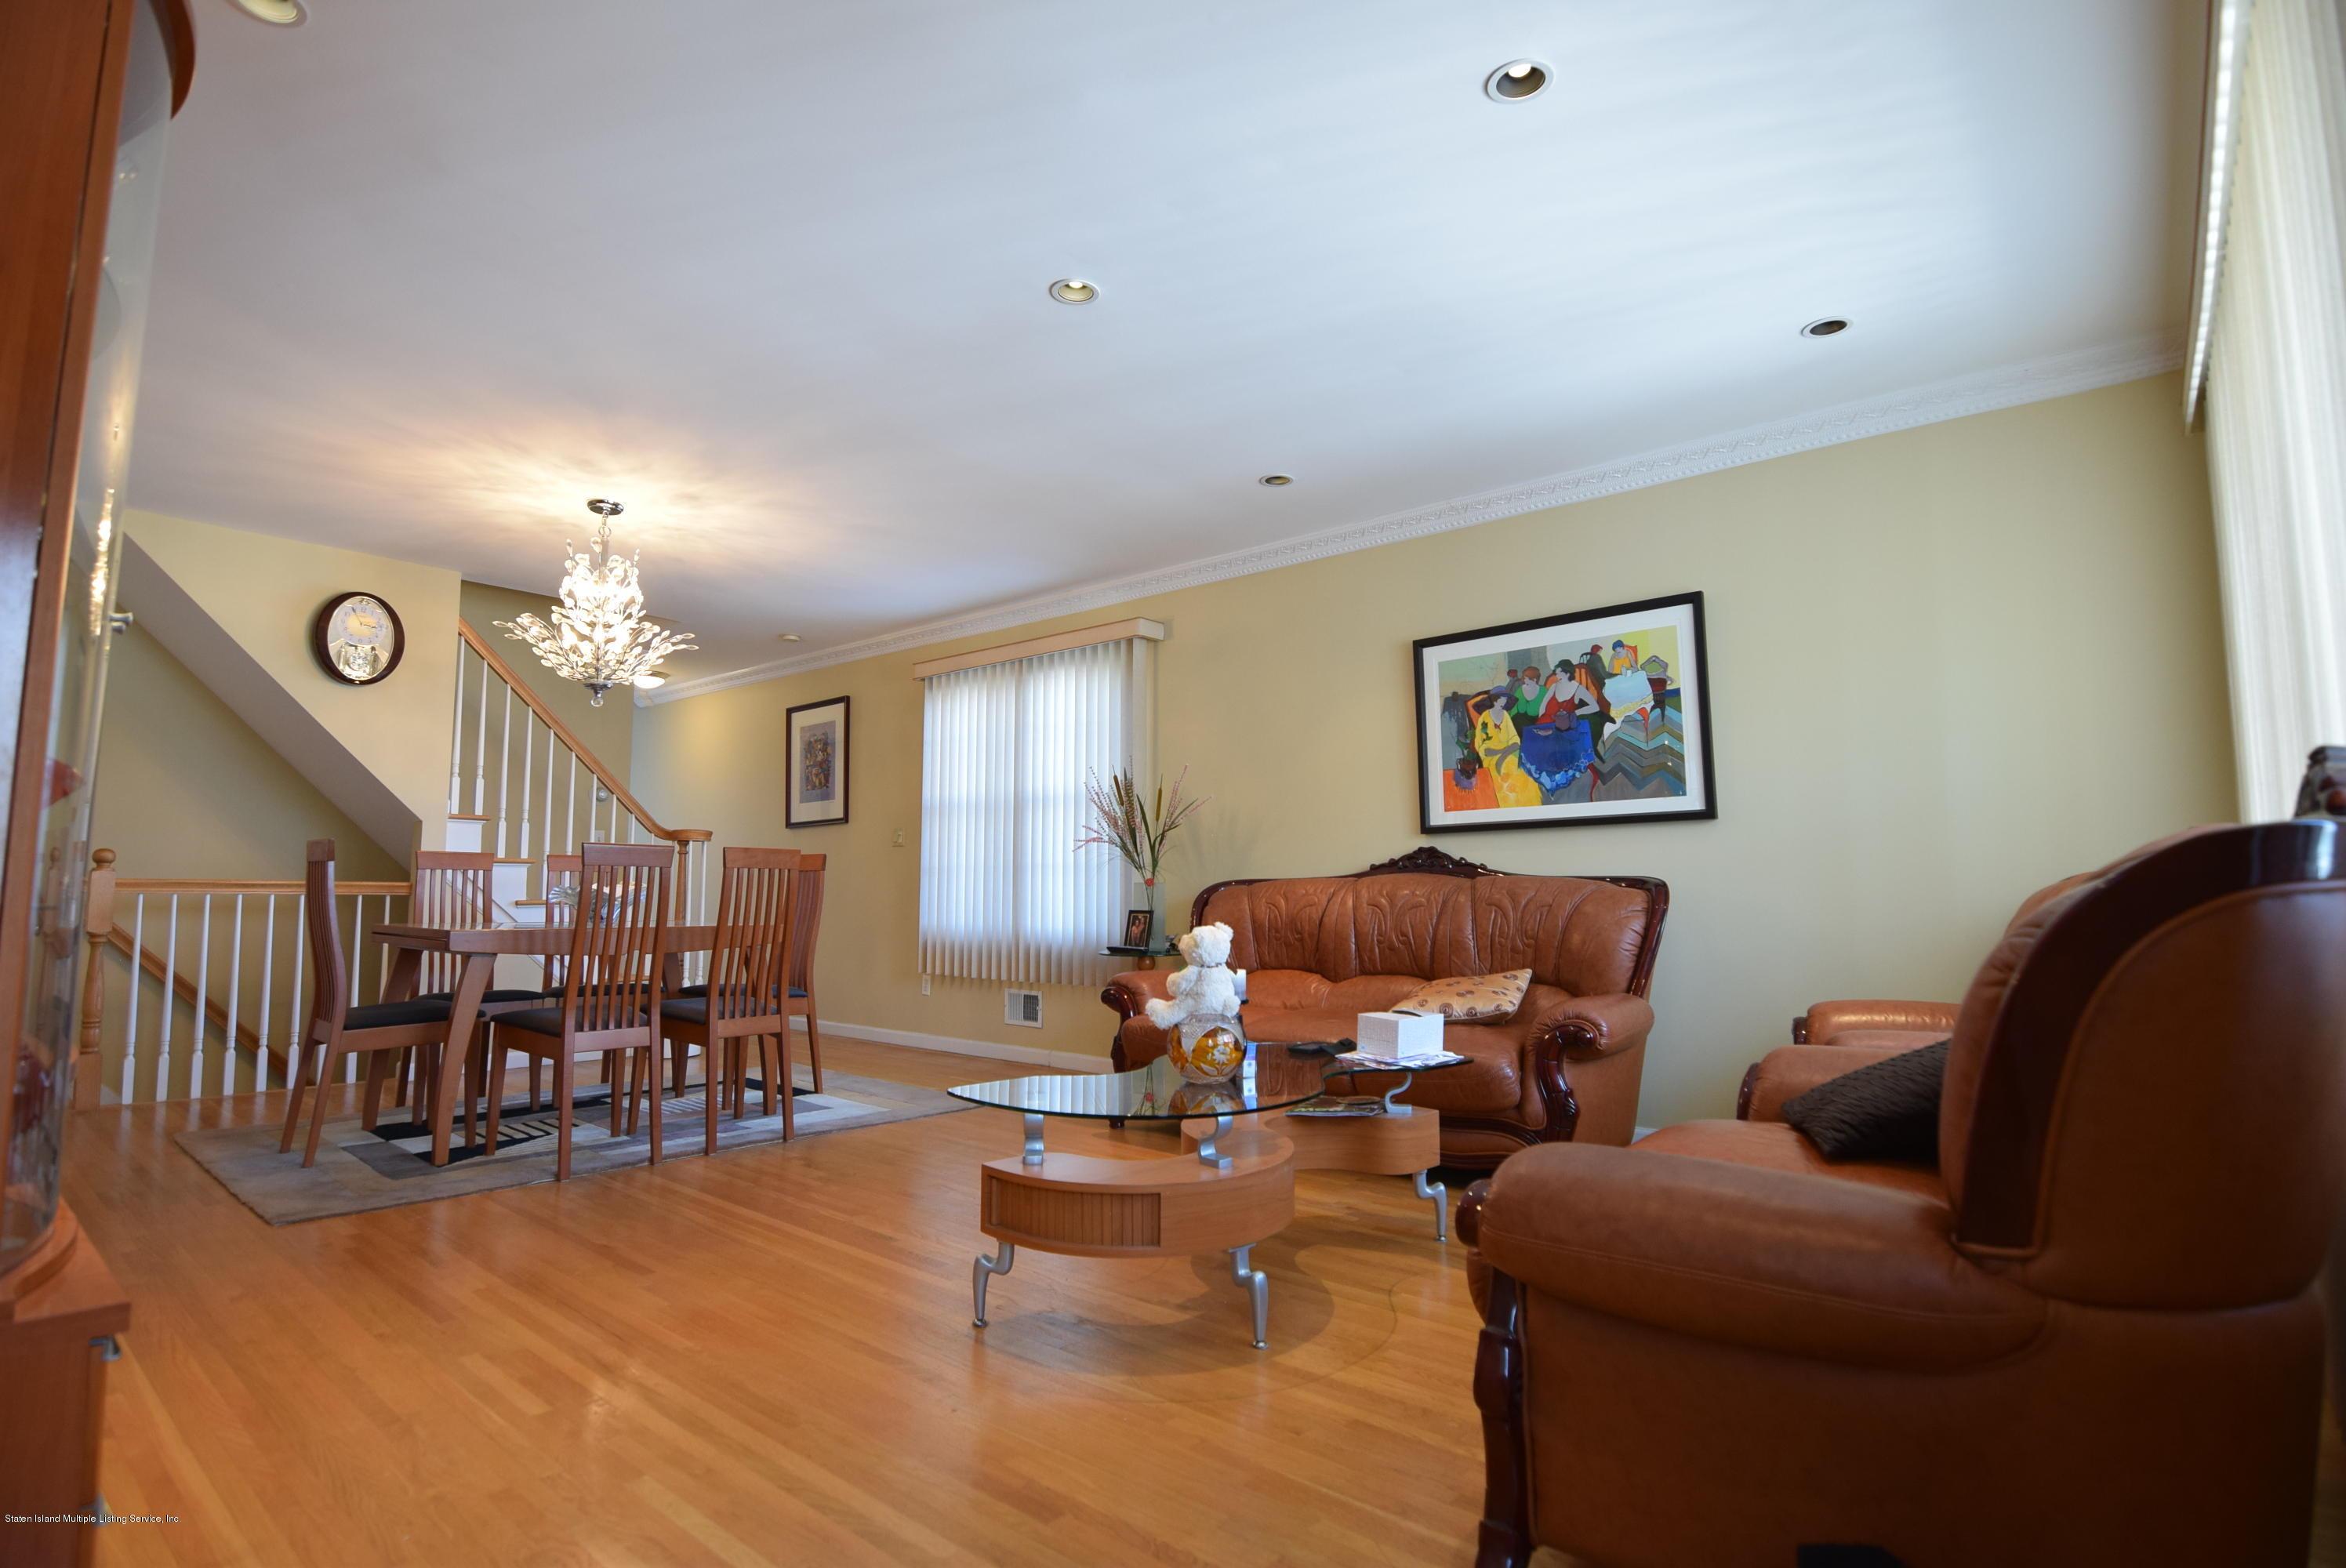 Single Family - Semi-Attached 15 Erwin Court  Staten Island, NY 10306, MLS-1126740-2